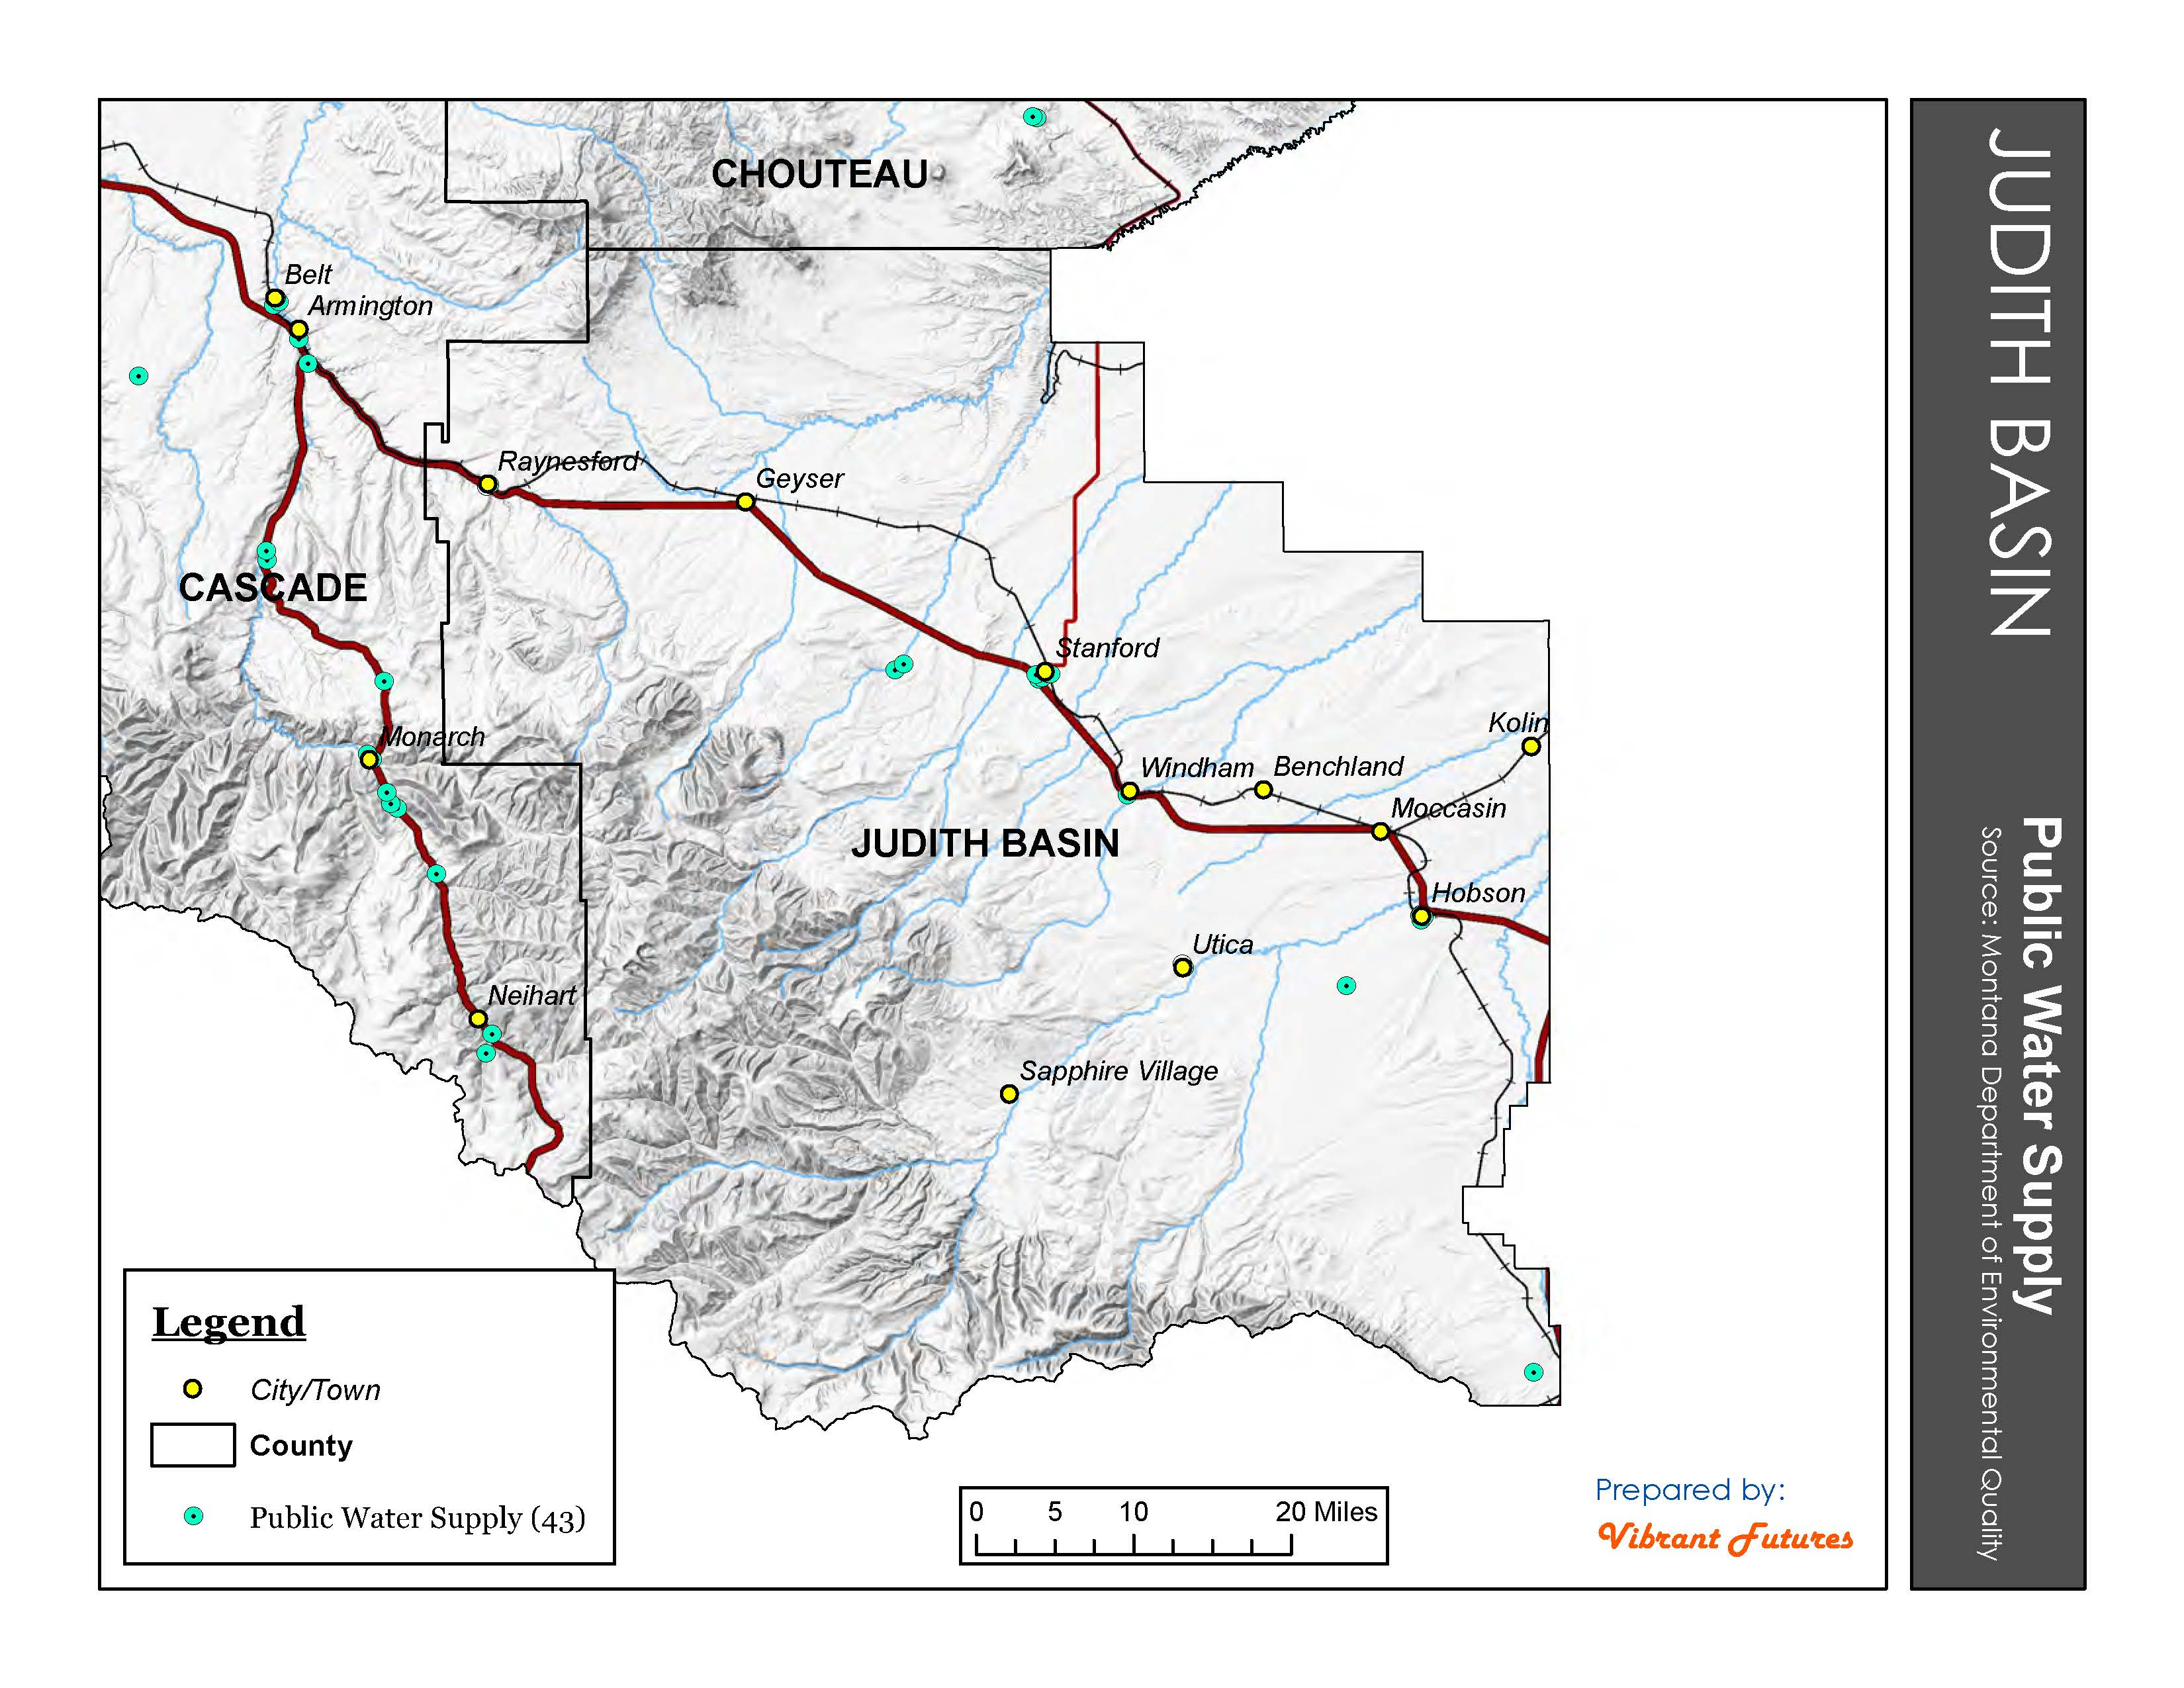 Public Water Supply Judith Basin County